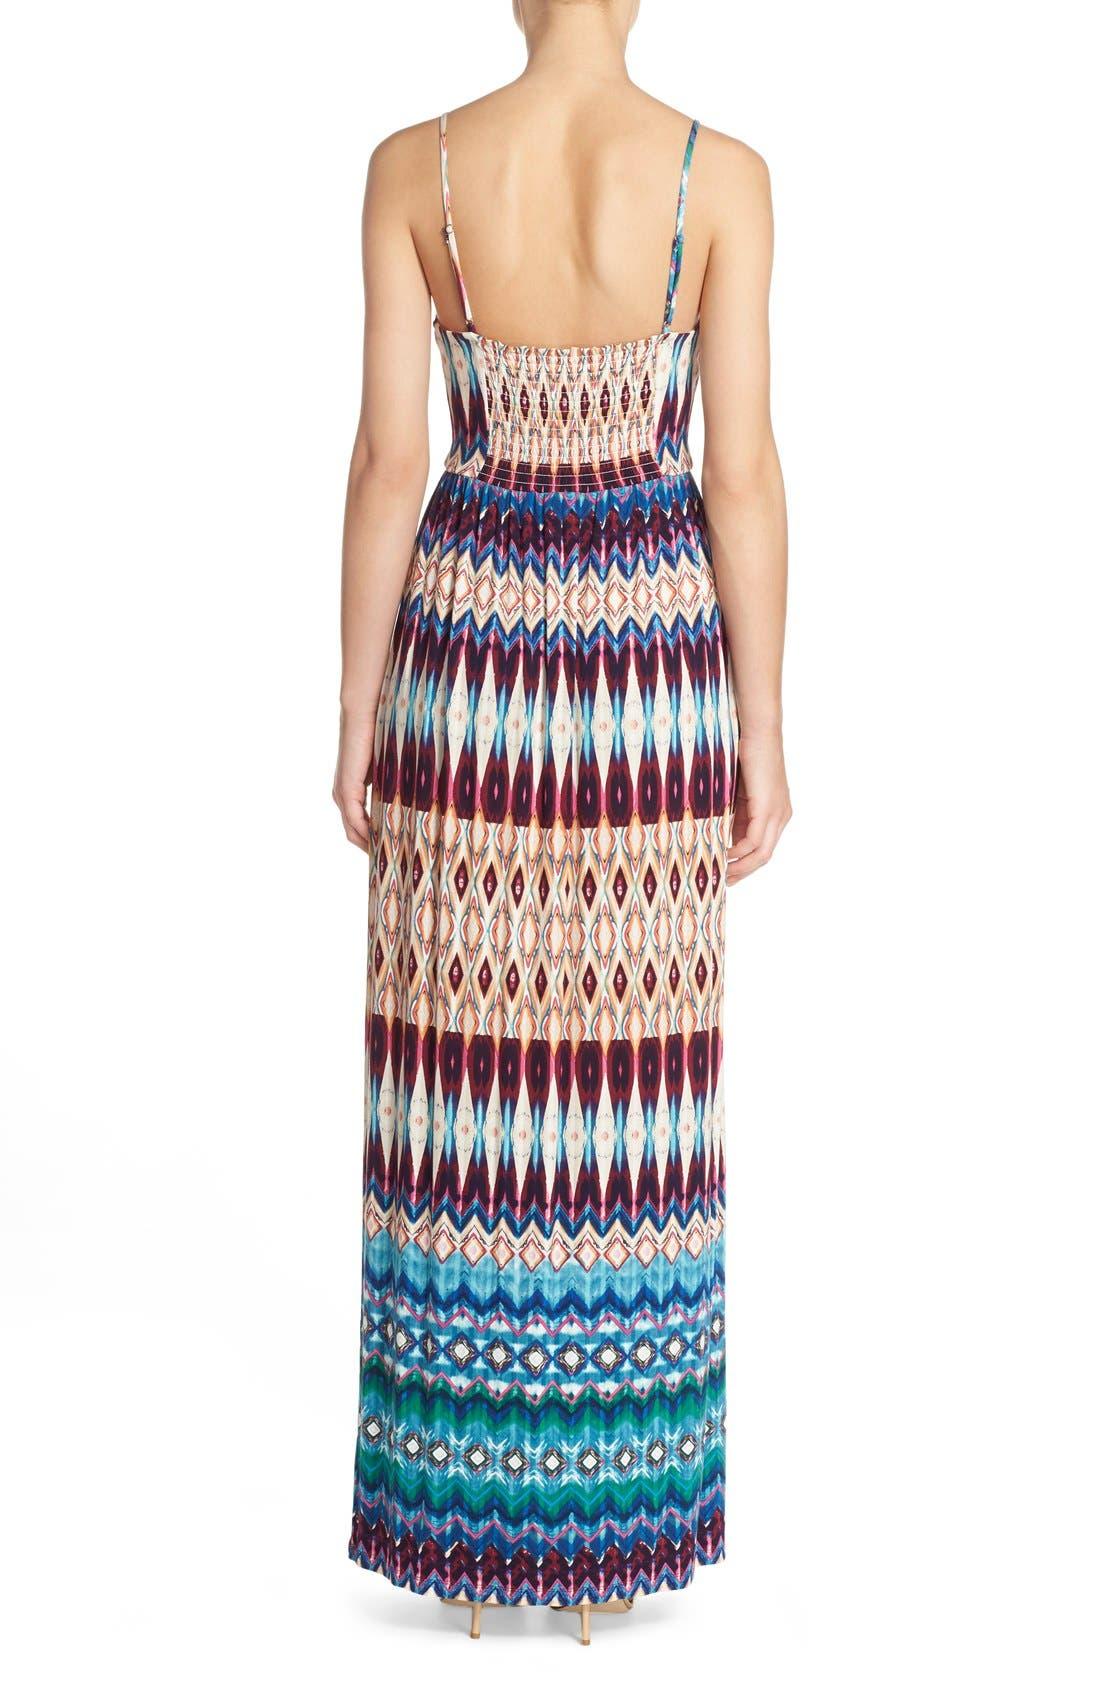 Alternate Image 3  - Felicity & Coco Floral Print Jersey Maxi Dress (Regular & Petite) (Nordstrom Exclusive)